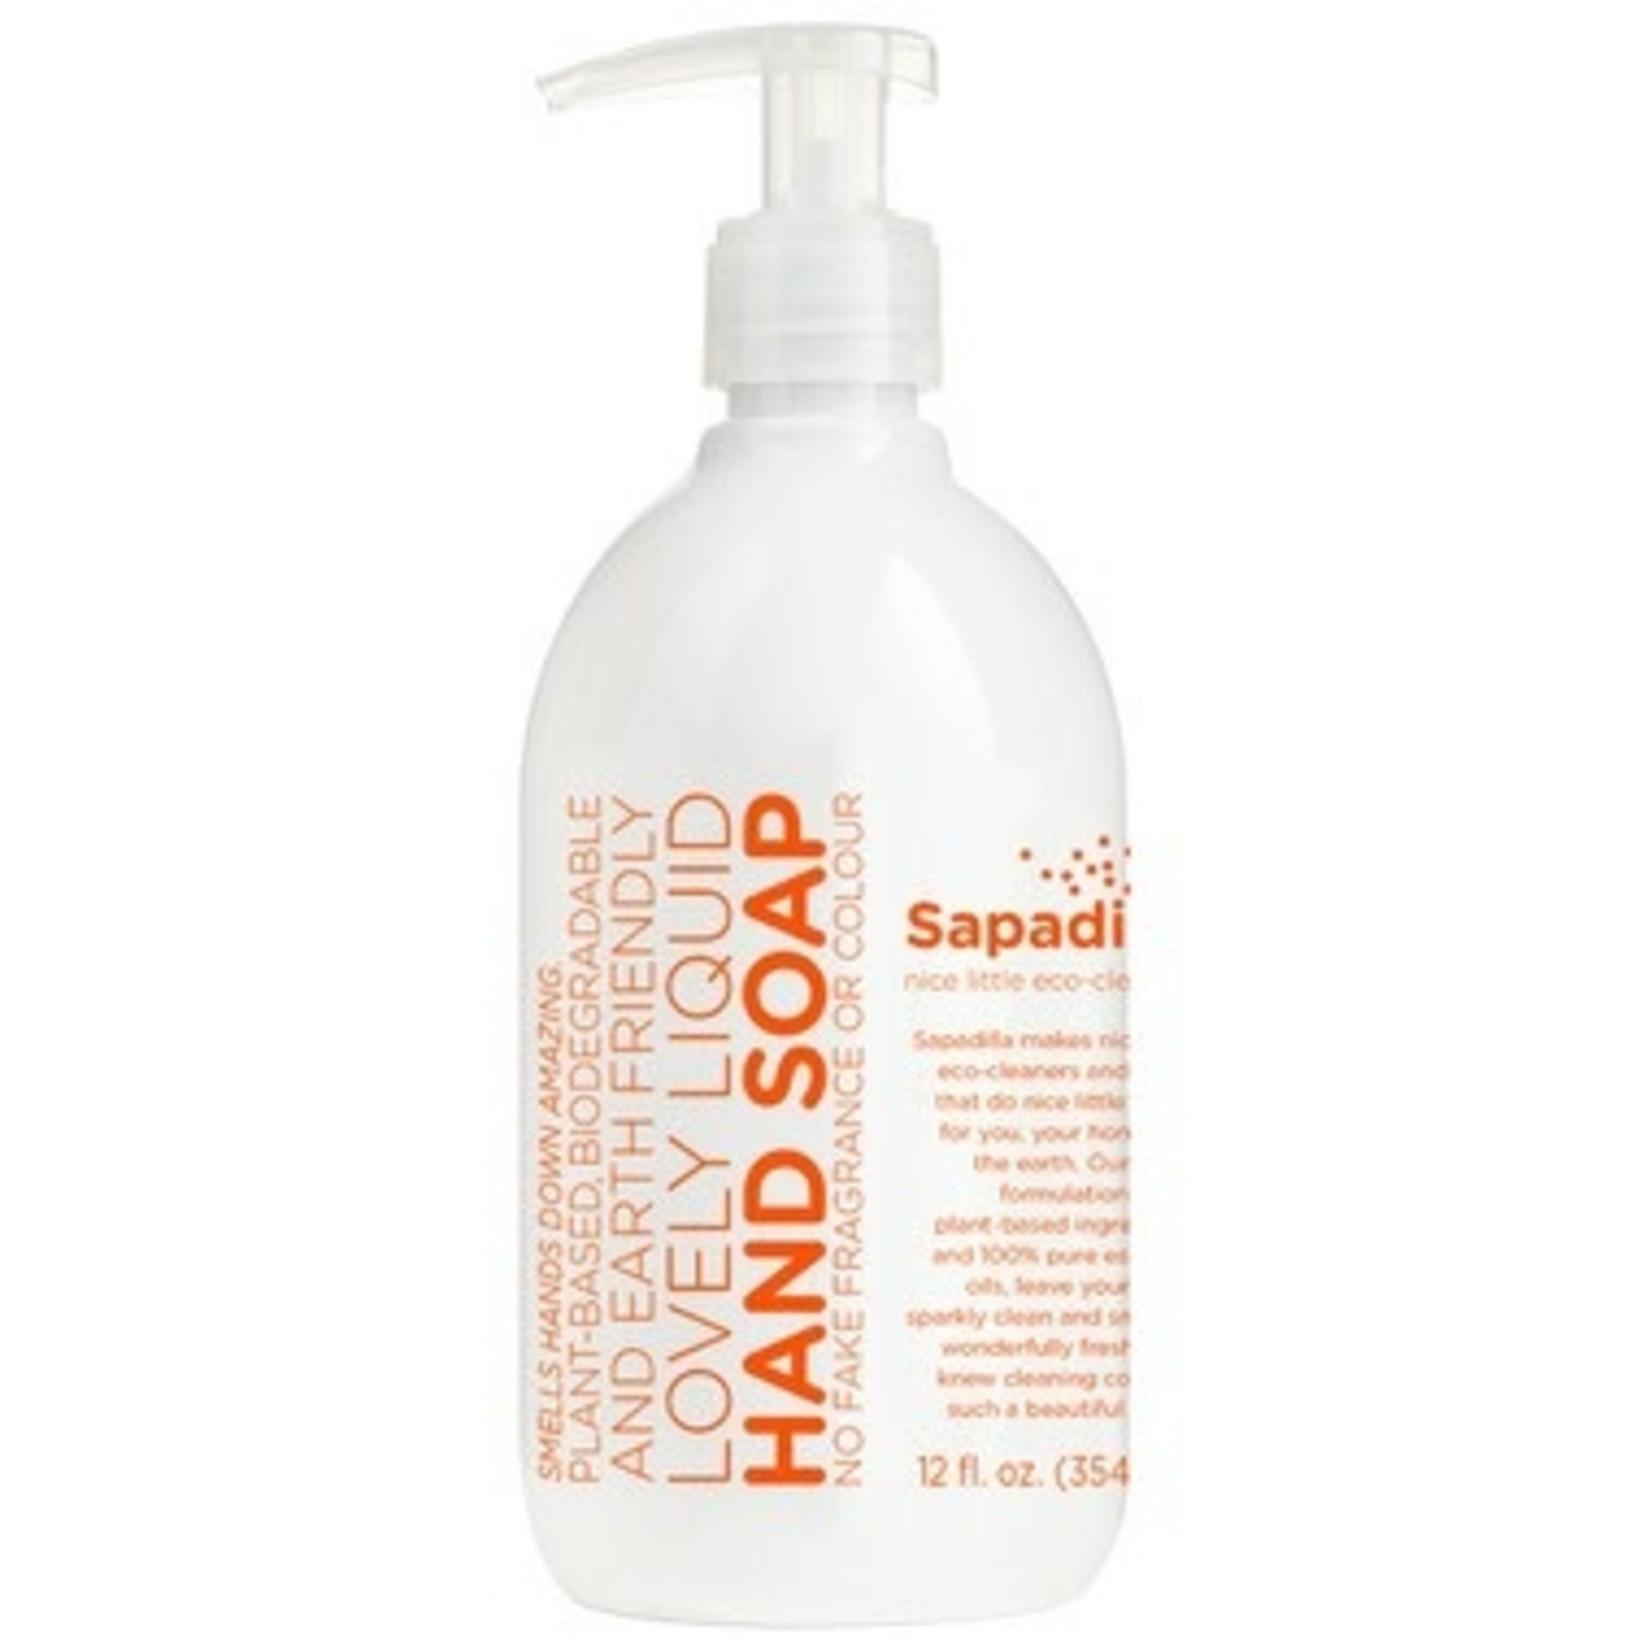 SAPADILLA HAND SOAP - GRAPEFRUIT + BERGAMOT